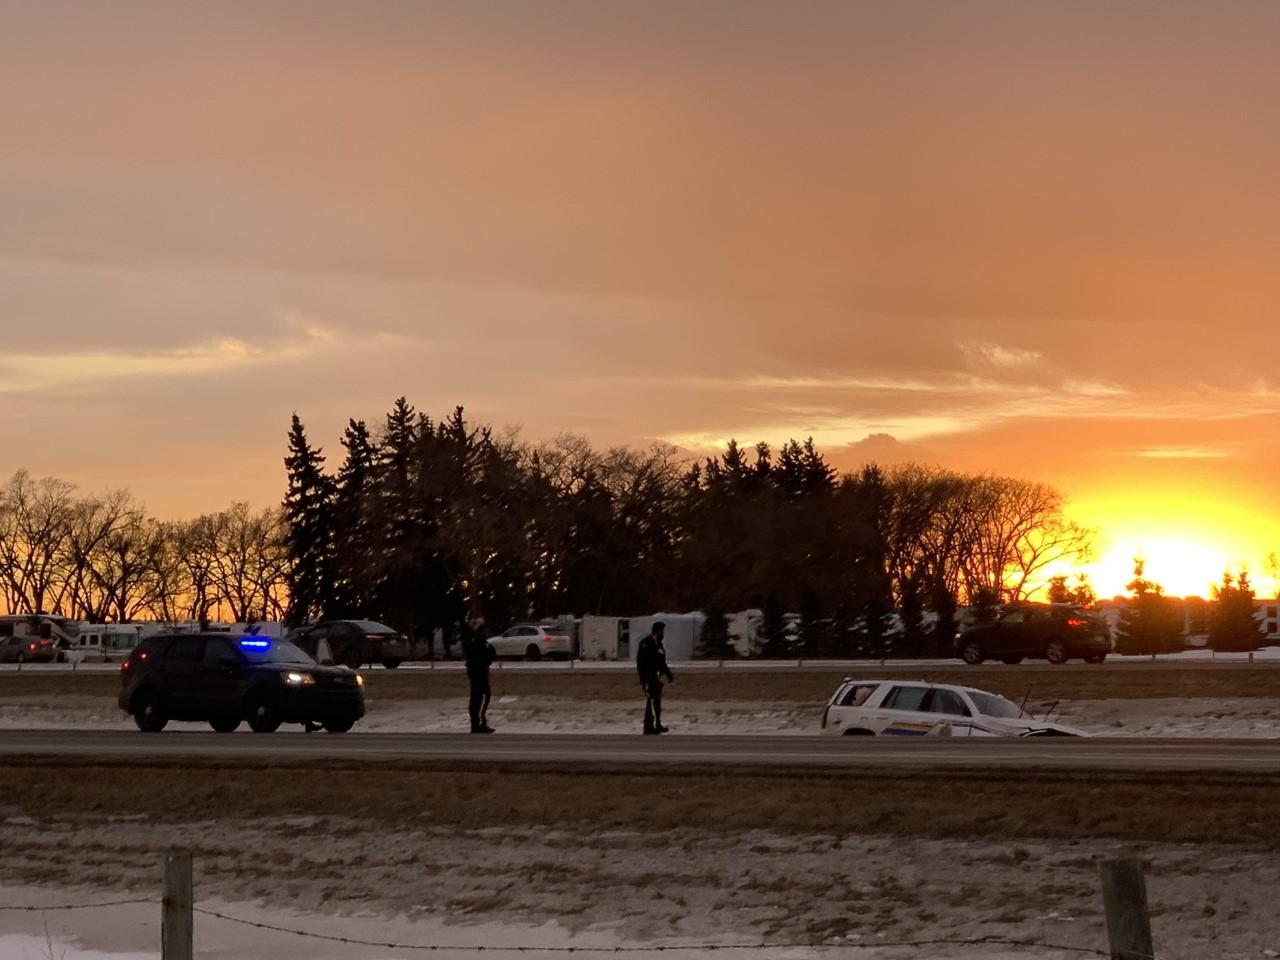 1 Mountie injured, 2 people arrested during pursuit near Edmonton following gun incident